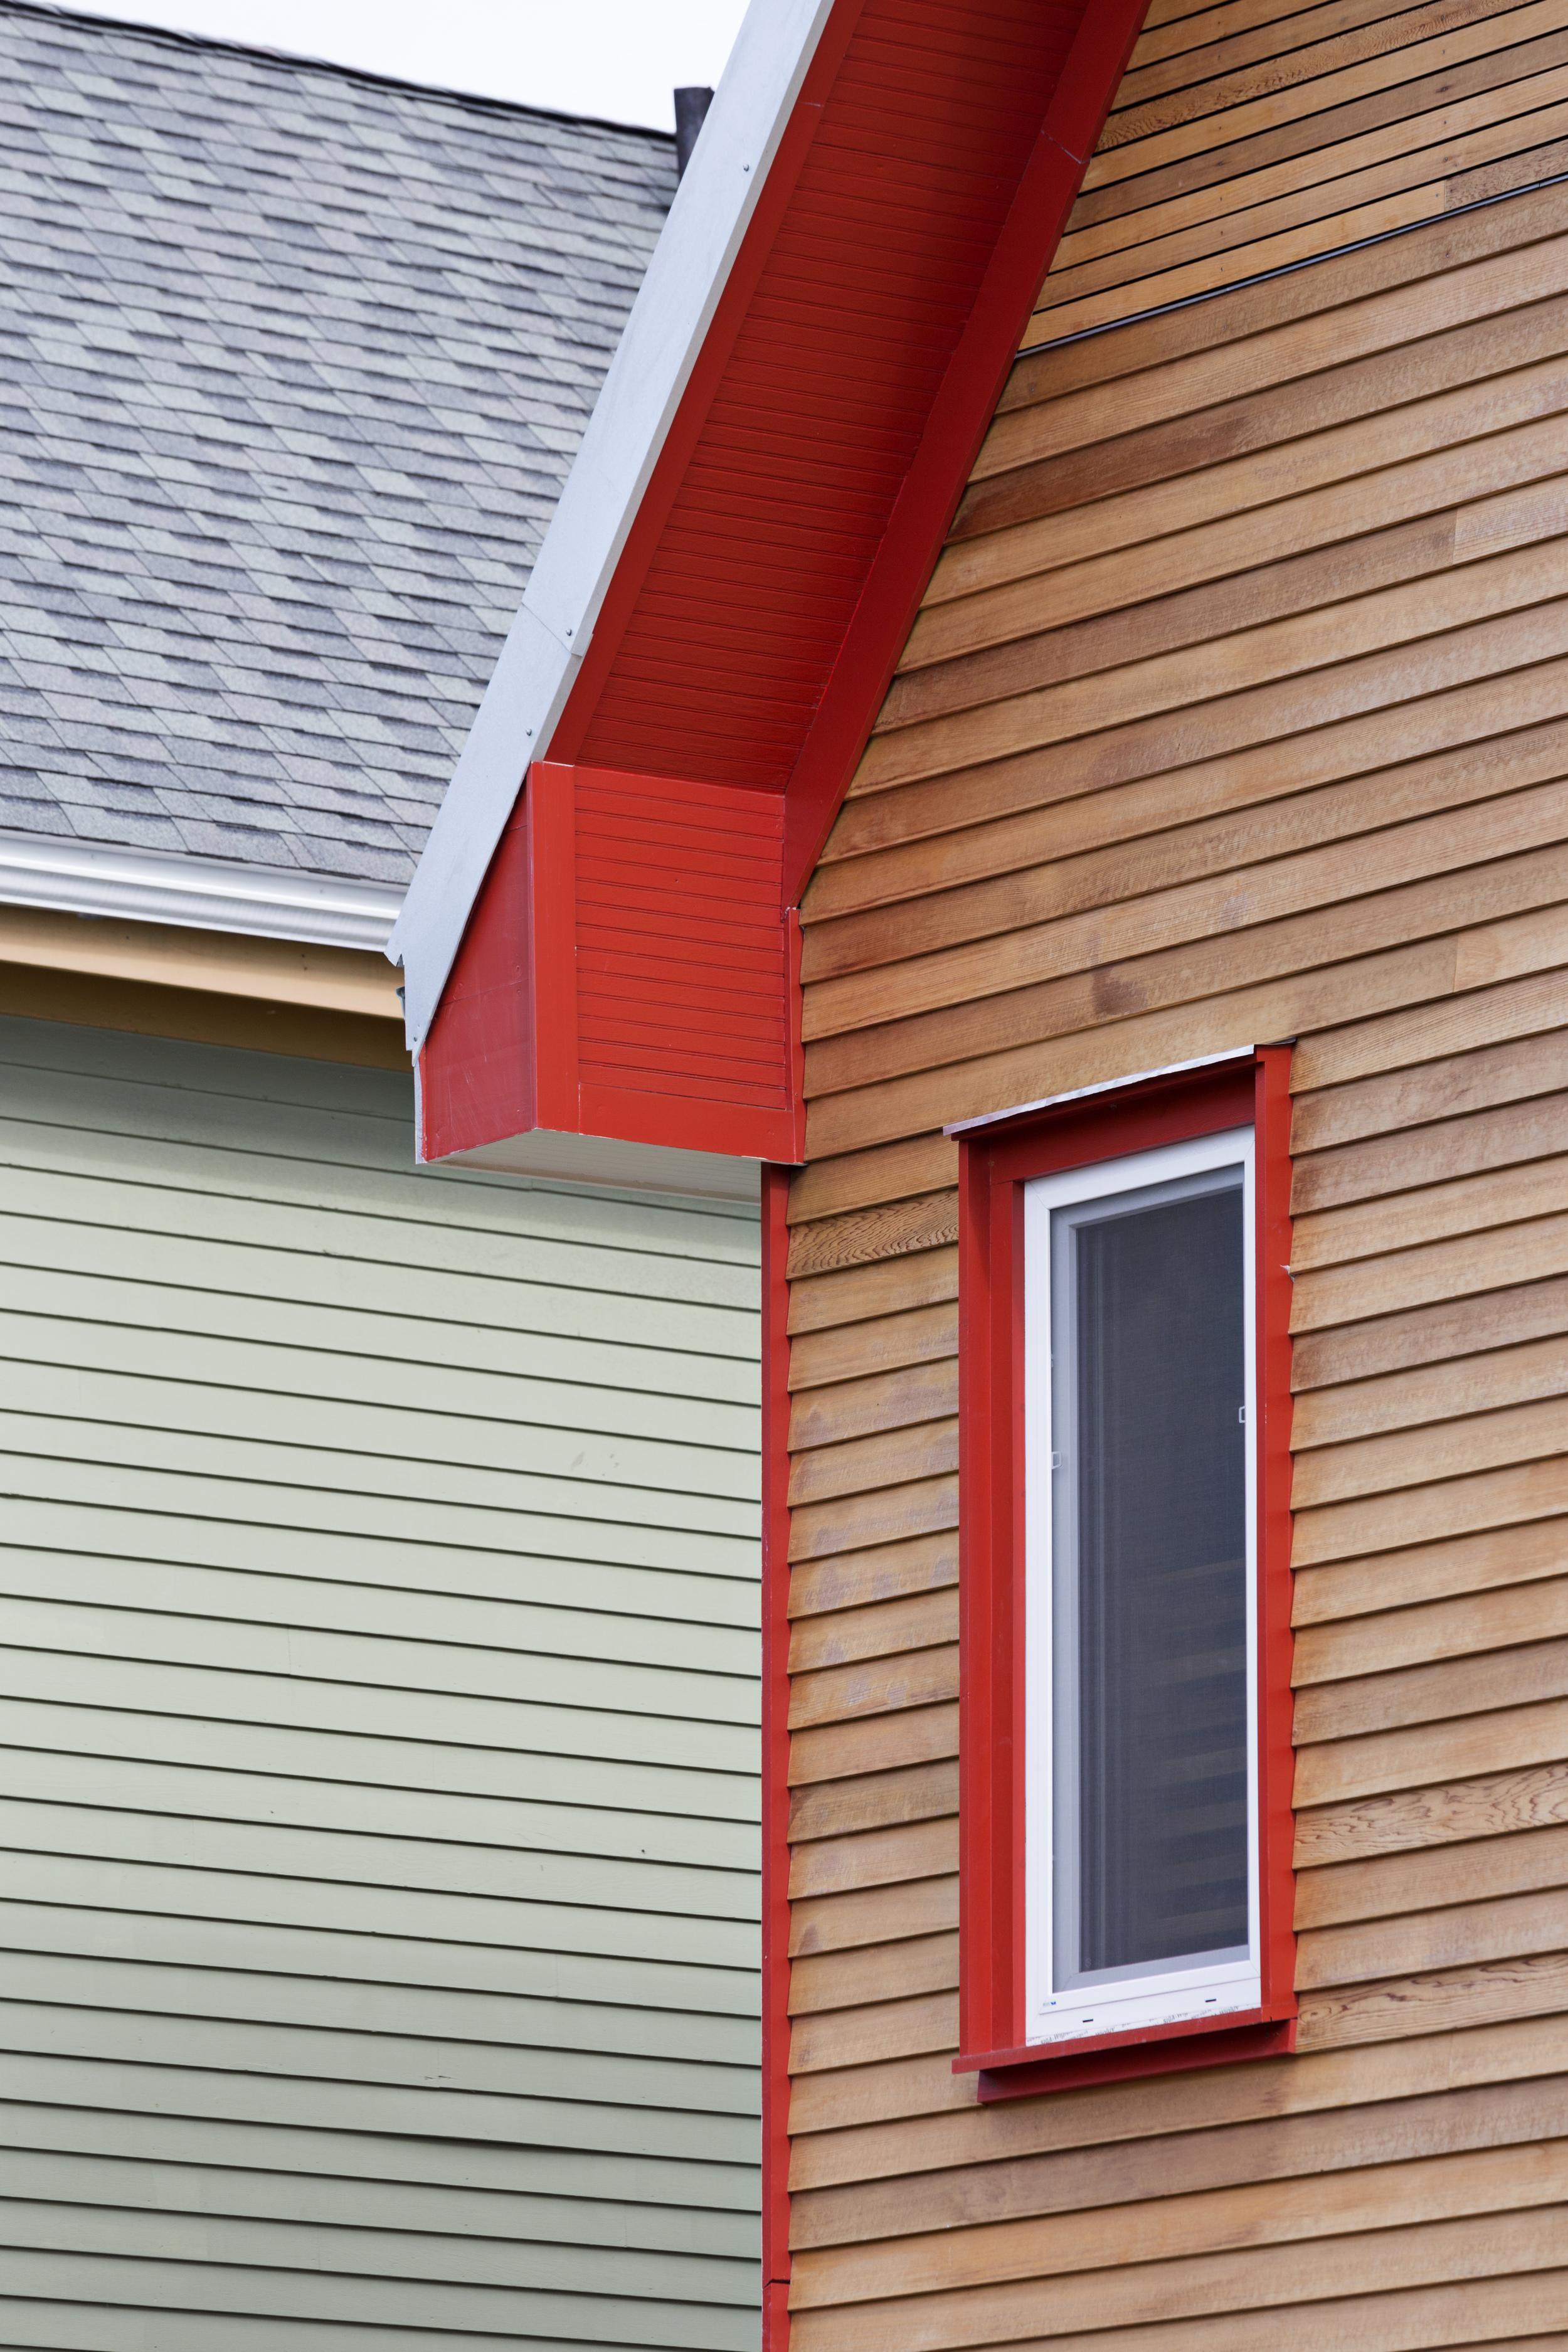 Exterior Siding Window Roof.jpg